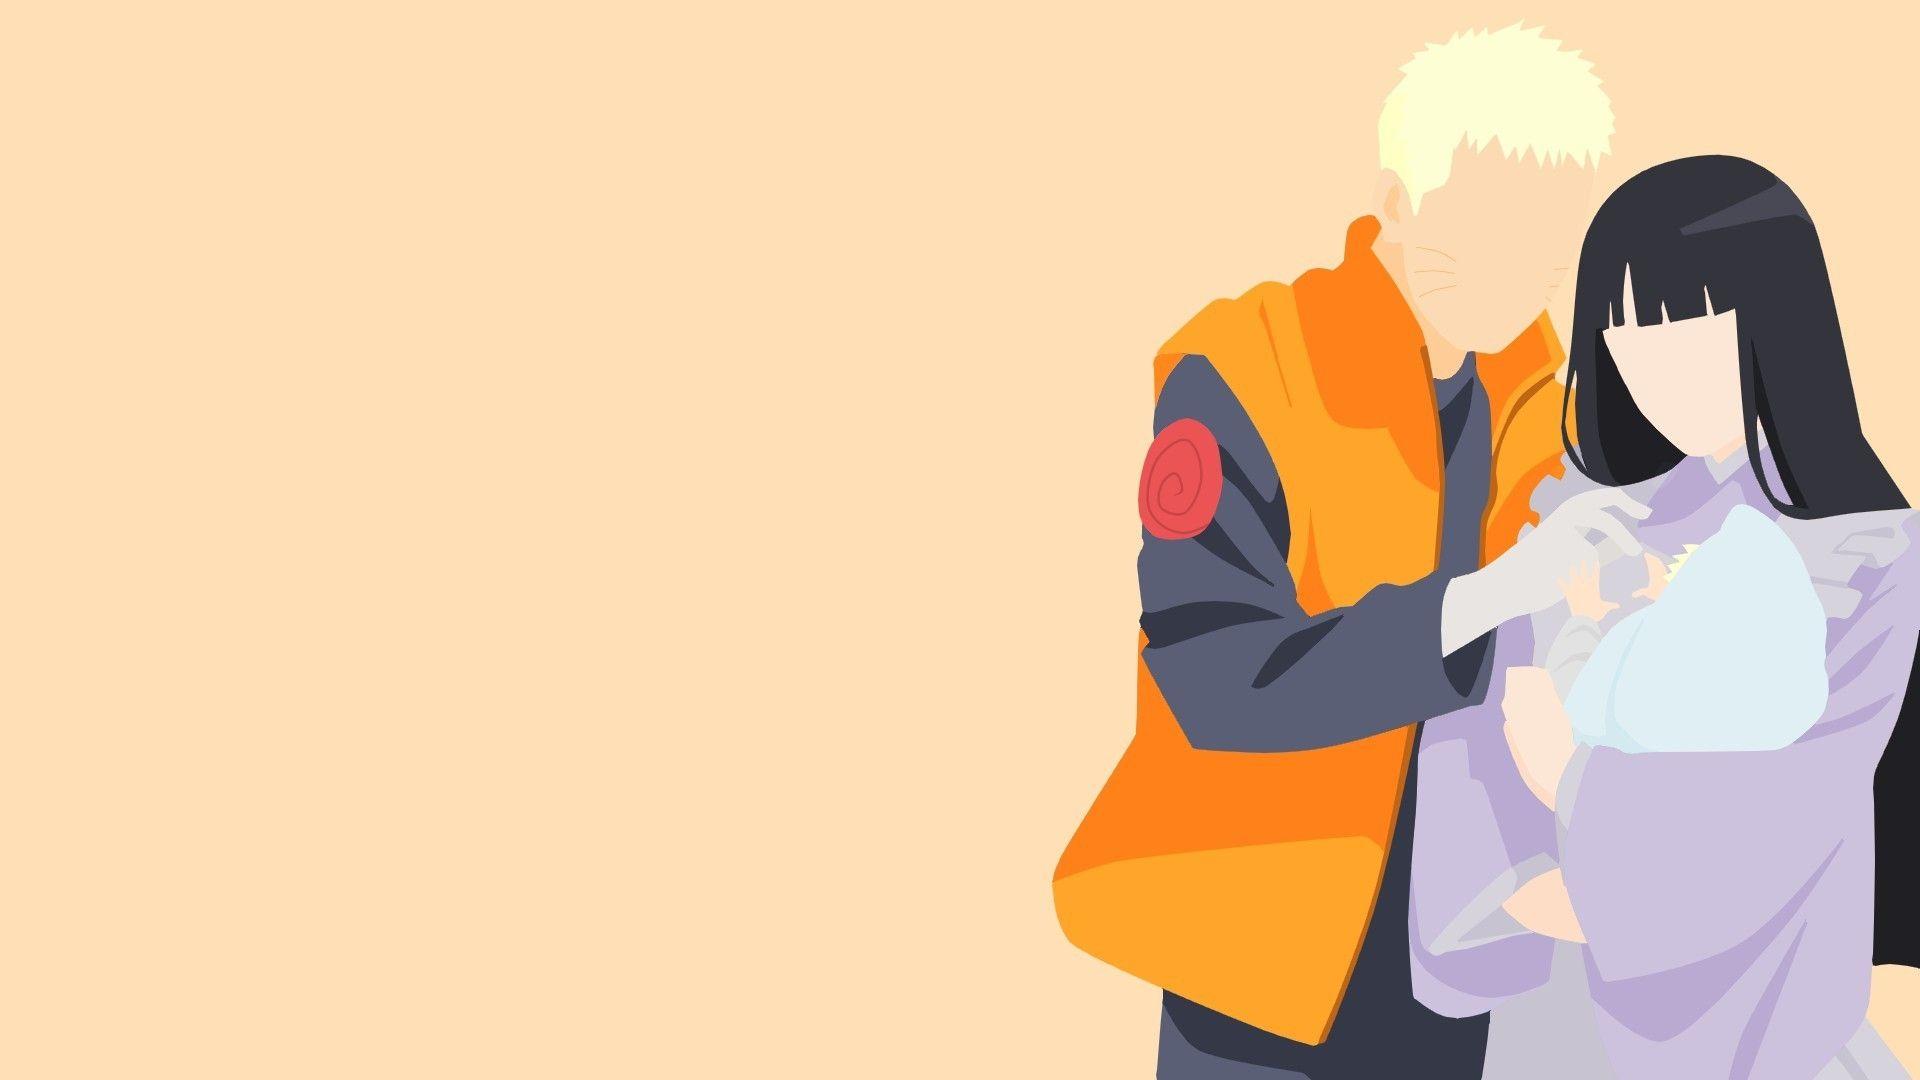 Naruto Minimalist, 1080p Wallpaper